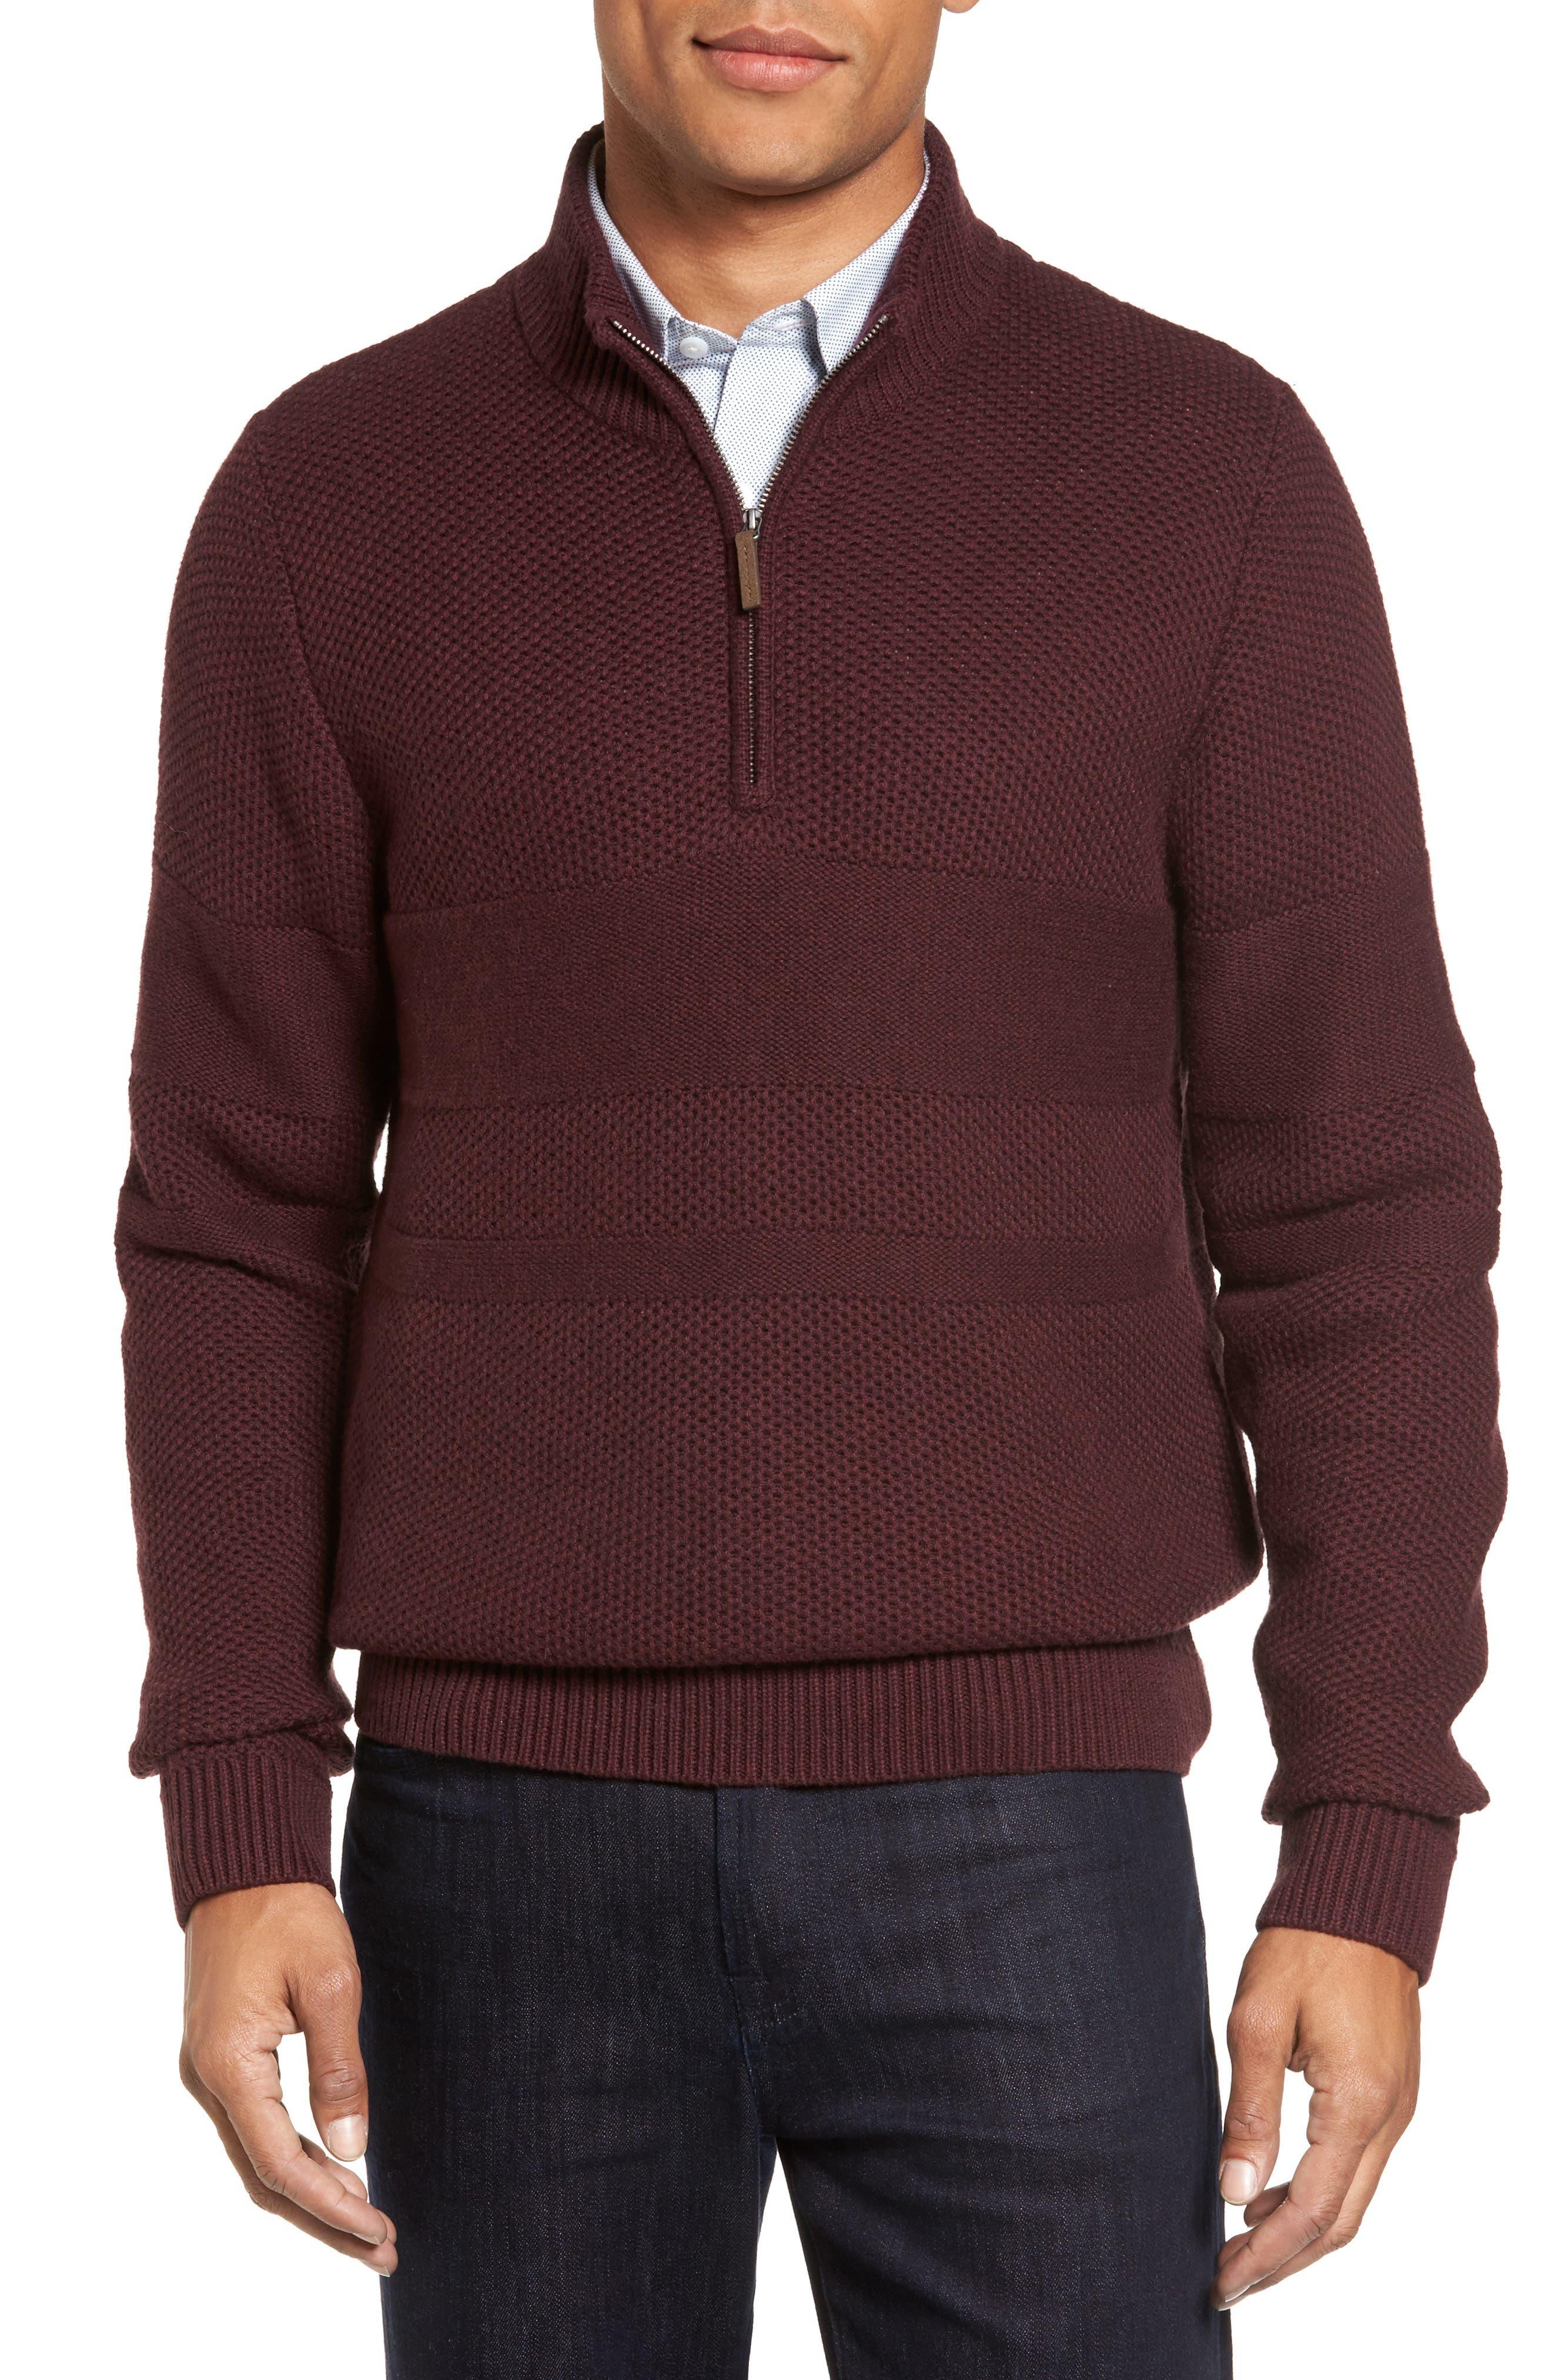 Alternate Image 1 Selected - Nordstrom Men's Shop Texture Cotton & Cashmere Quarter Zip Sweater (Regular & Tall)